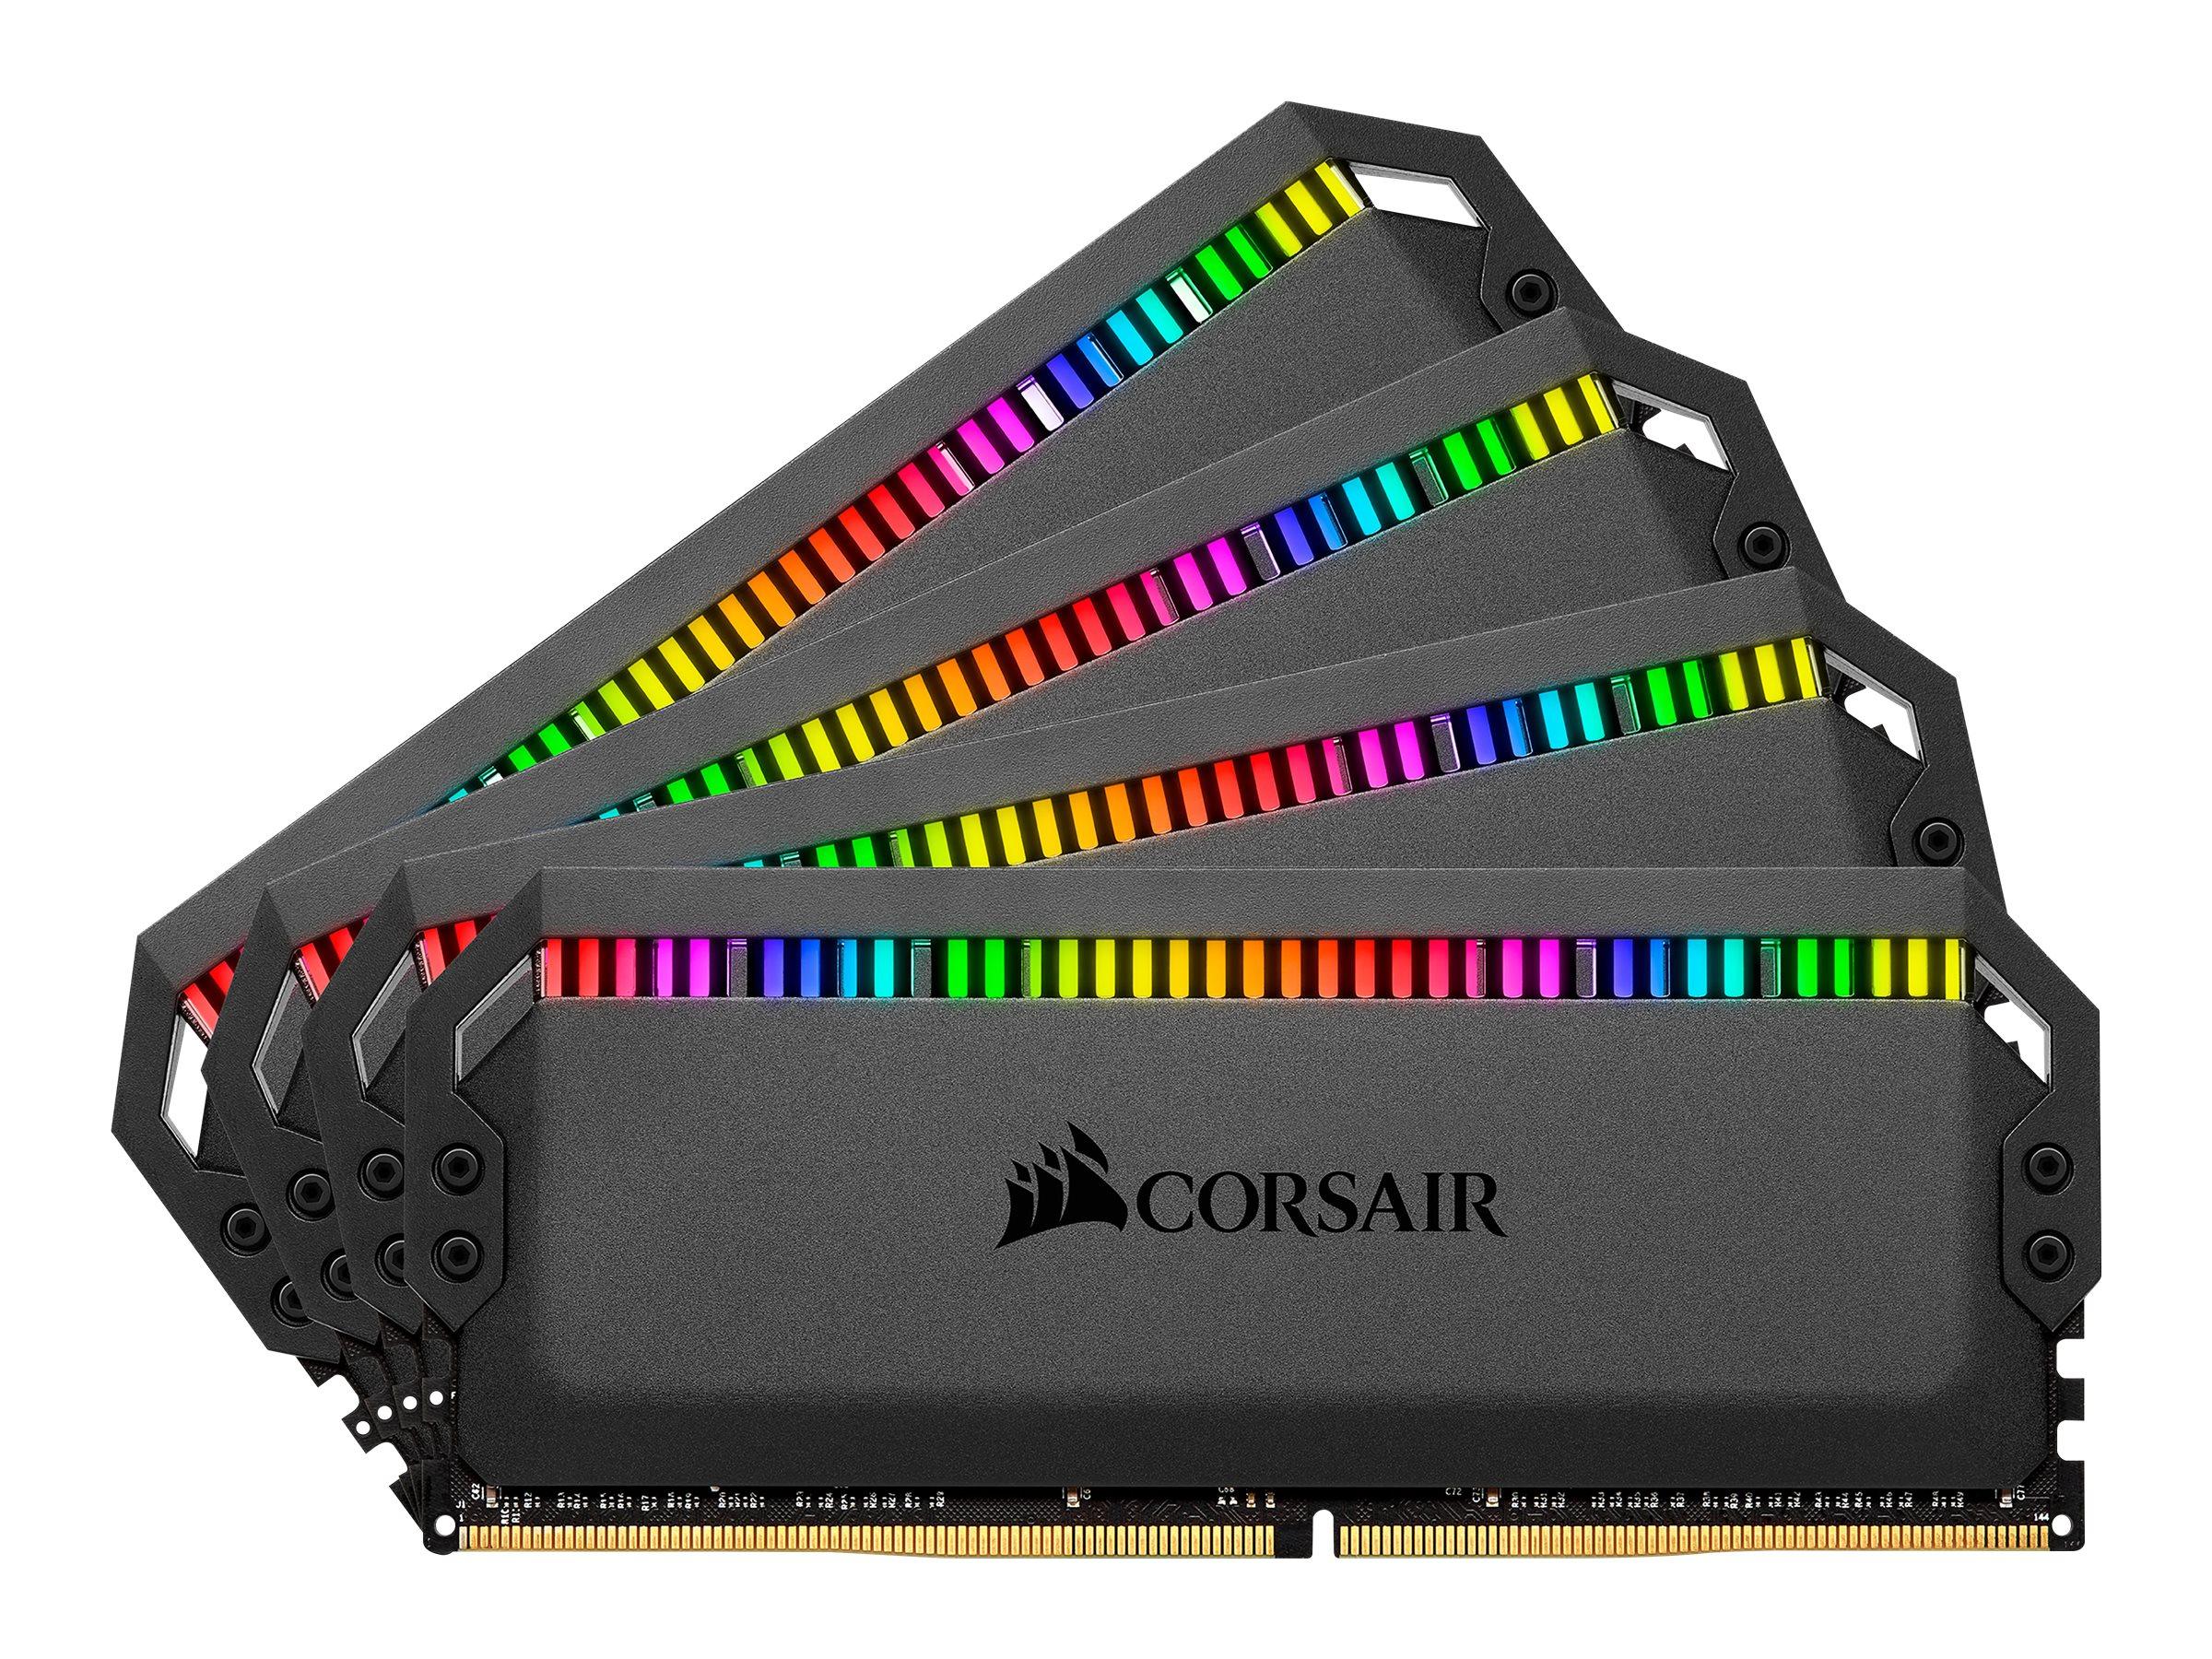 CORSAIR Dominator Platinum RGB - DDR4 - 128 GB: 4 x 32 GB - DIMM 288-PIN - 3200 MHz / PC4-25600 - CL16